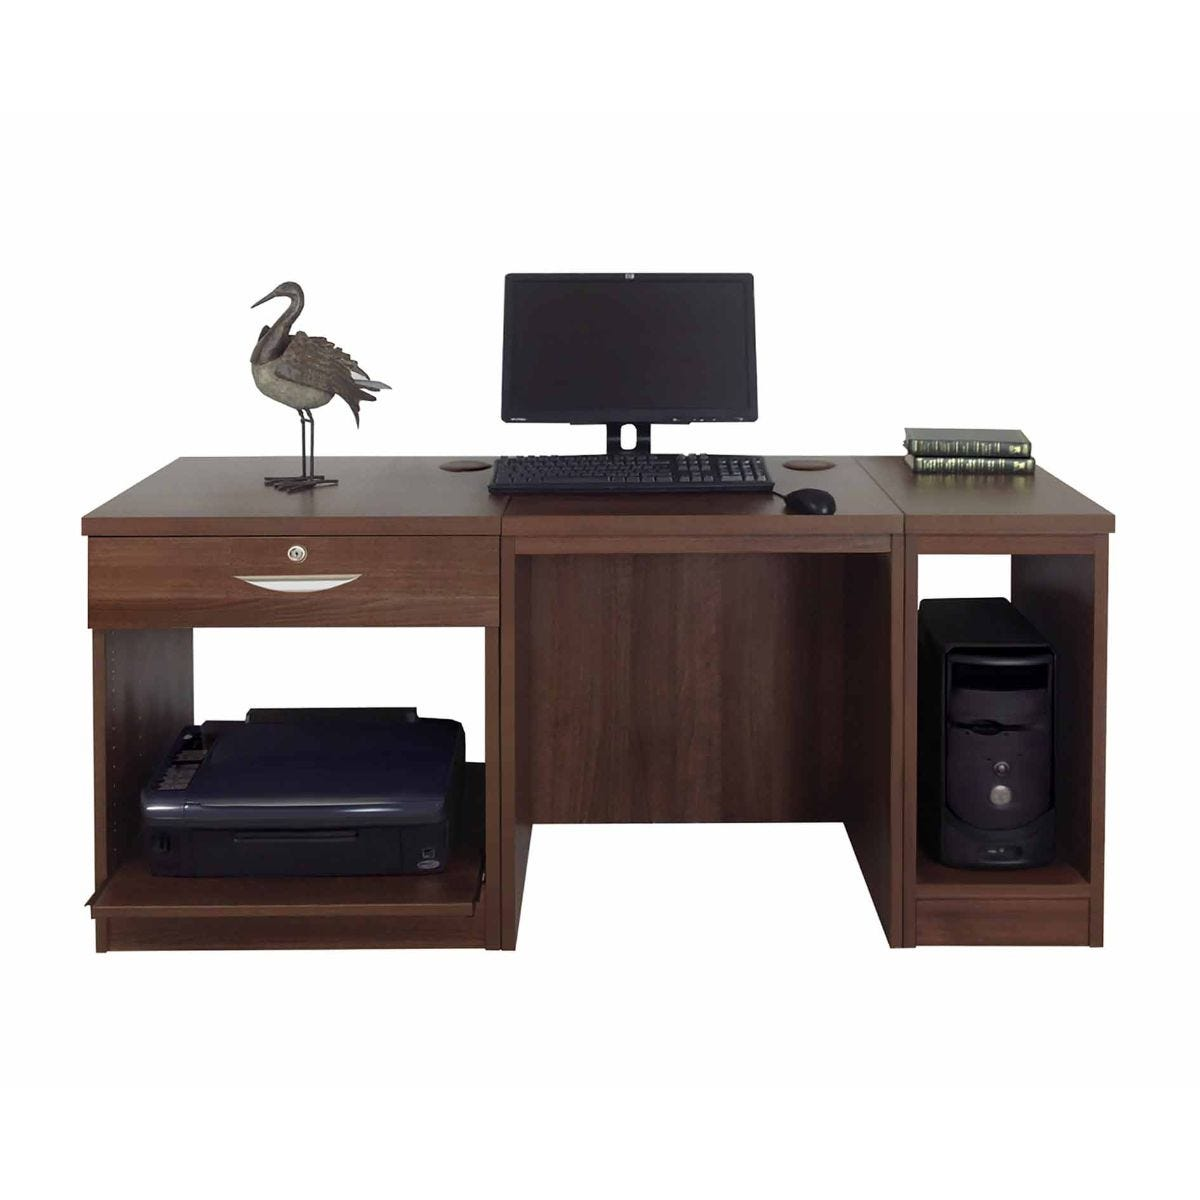 R White Home Office Furniture Desk, Walnut Wood Grain